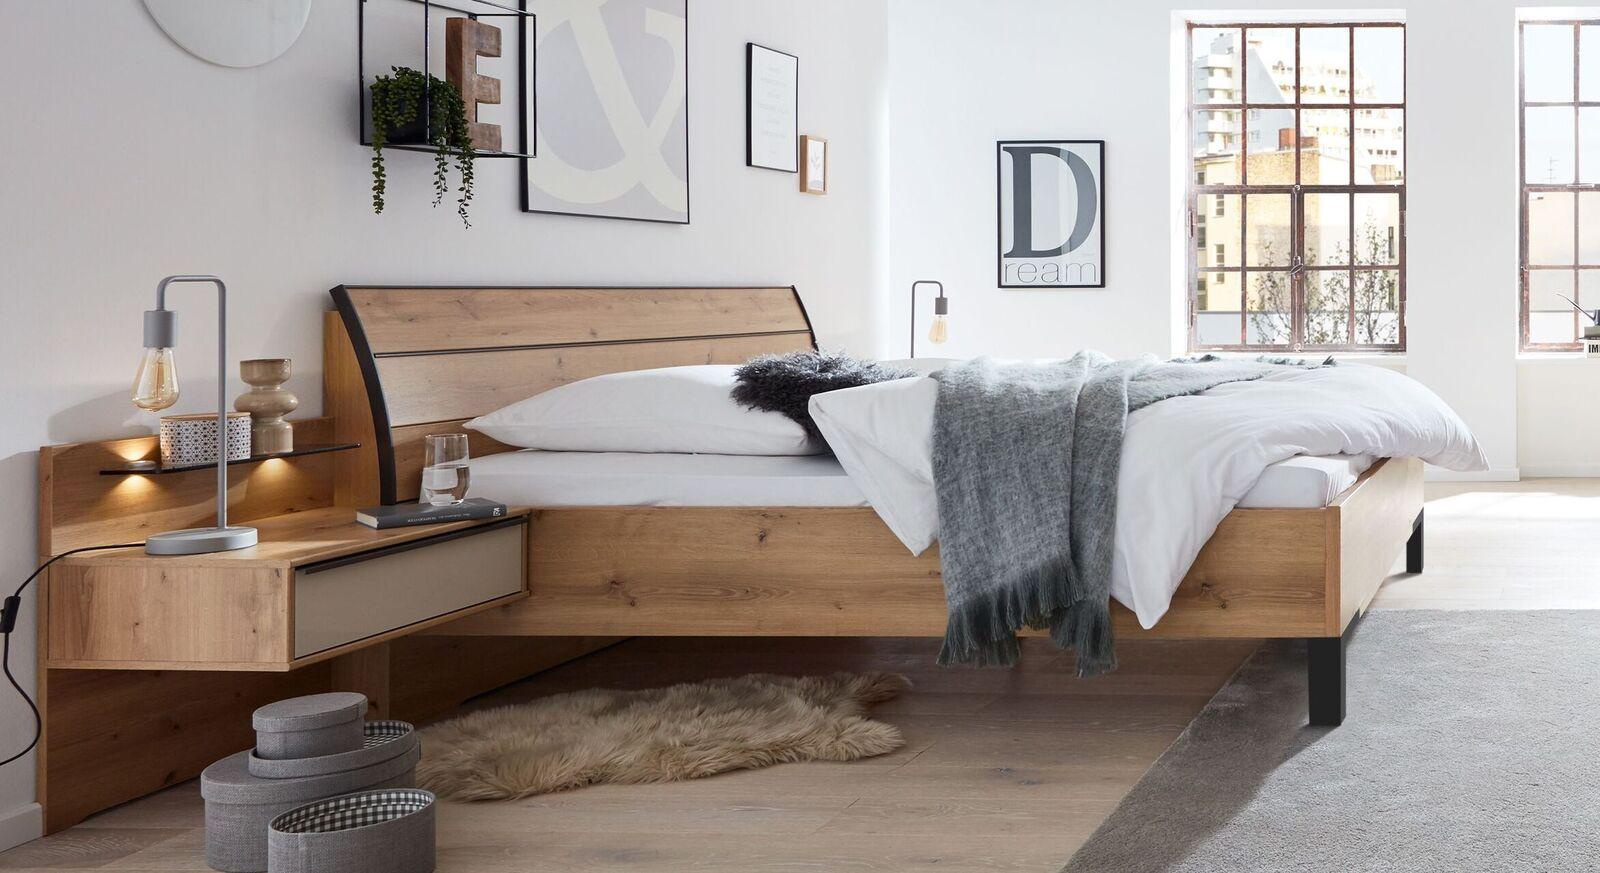 INTERLIVING Bett 1205 mit Komfort-Bettrahmenhöhe